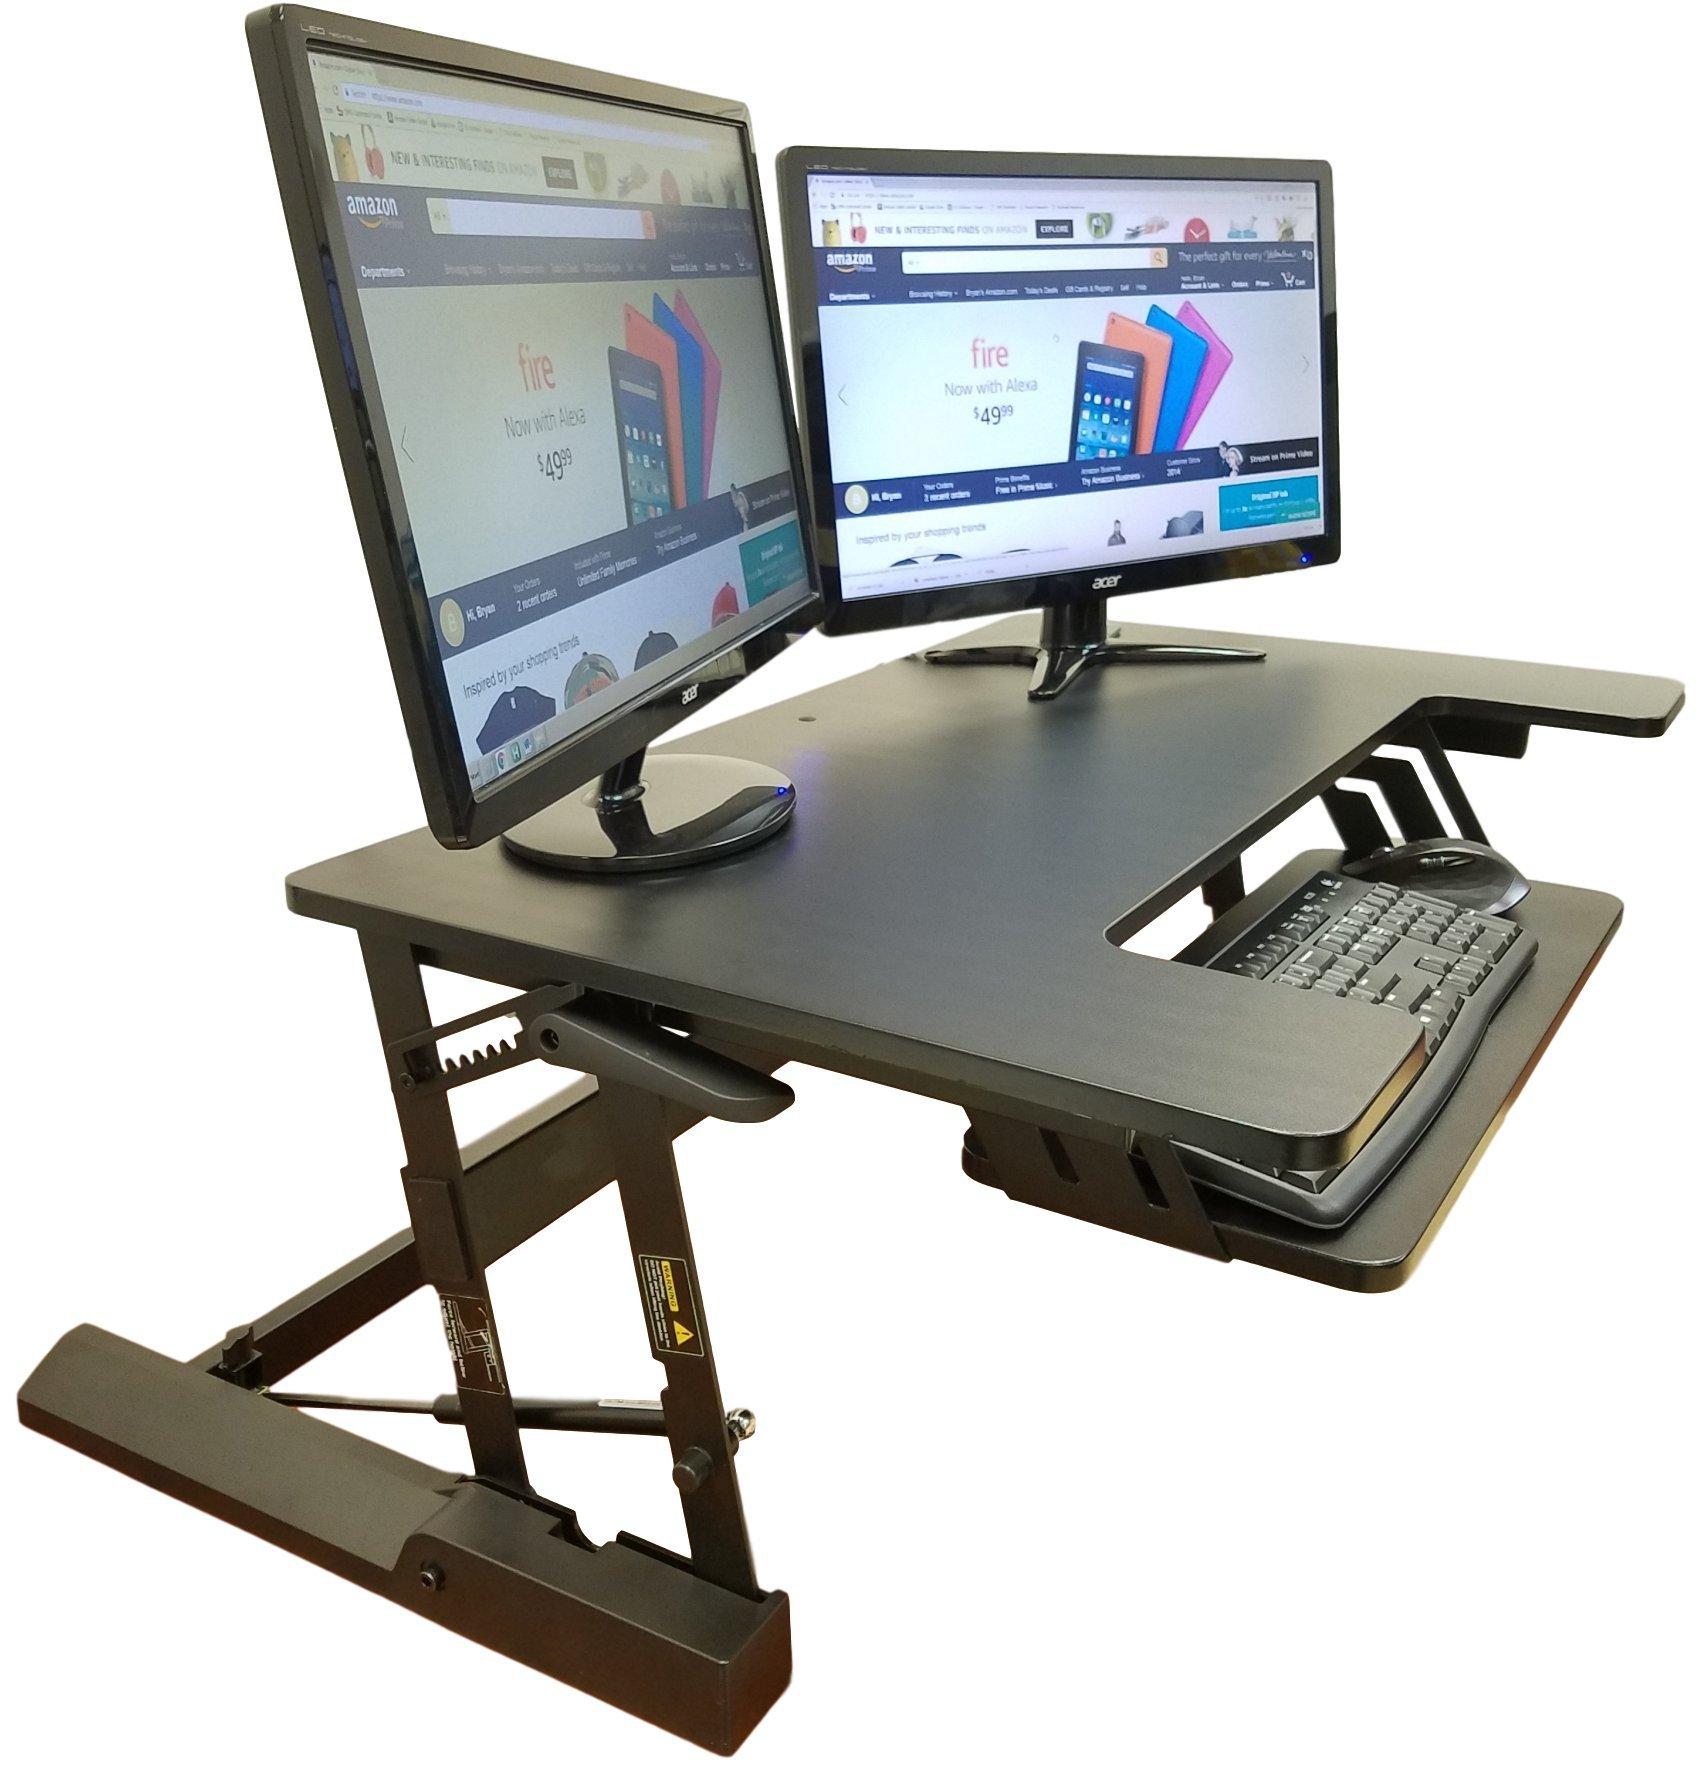 Standing Desk Height Adjustable Stand - Up Sit Stand Desks Converter Standup Workstation Fits Big Monitors 36'' Wide by High Supply